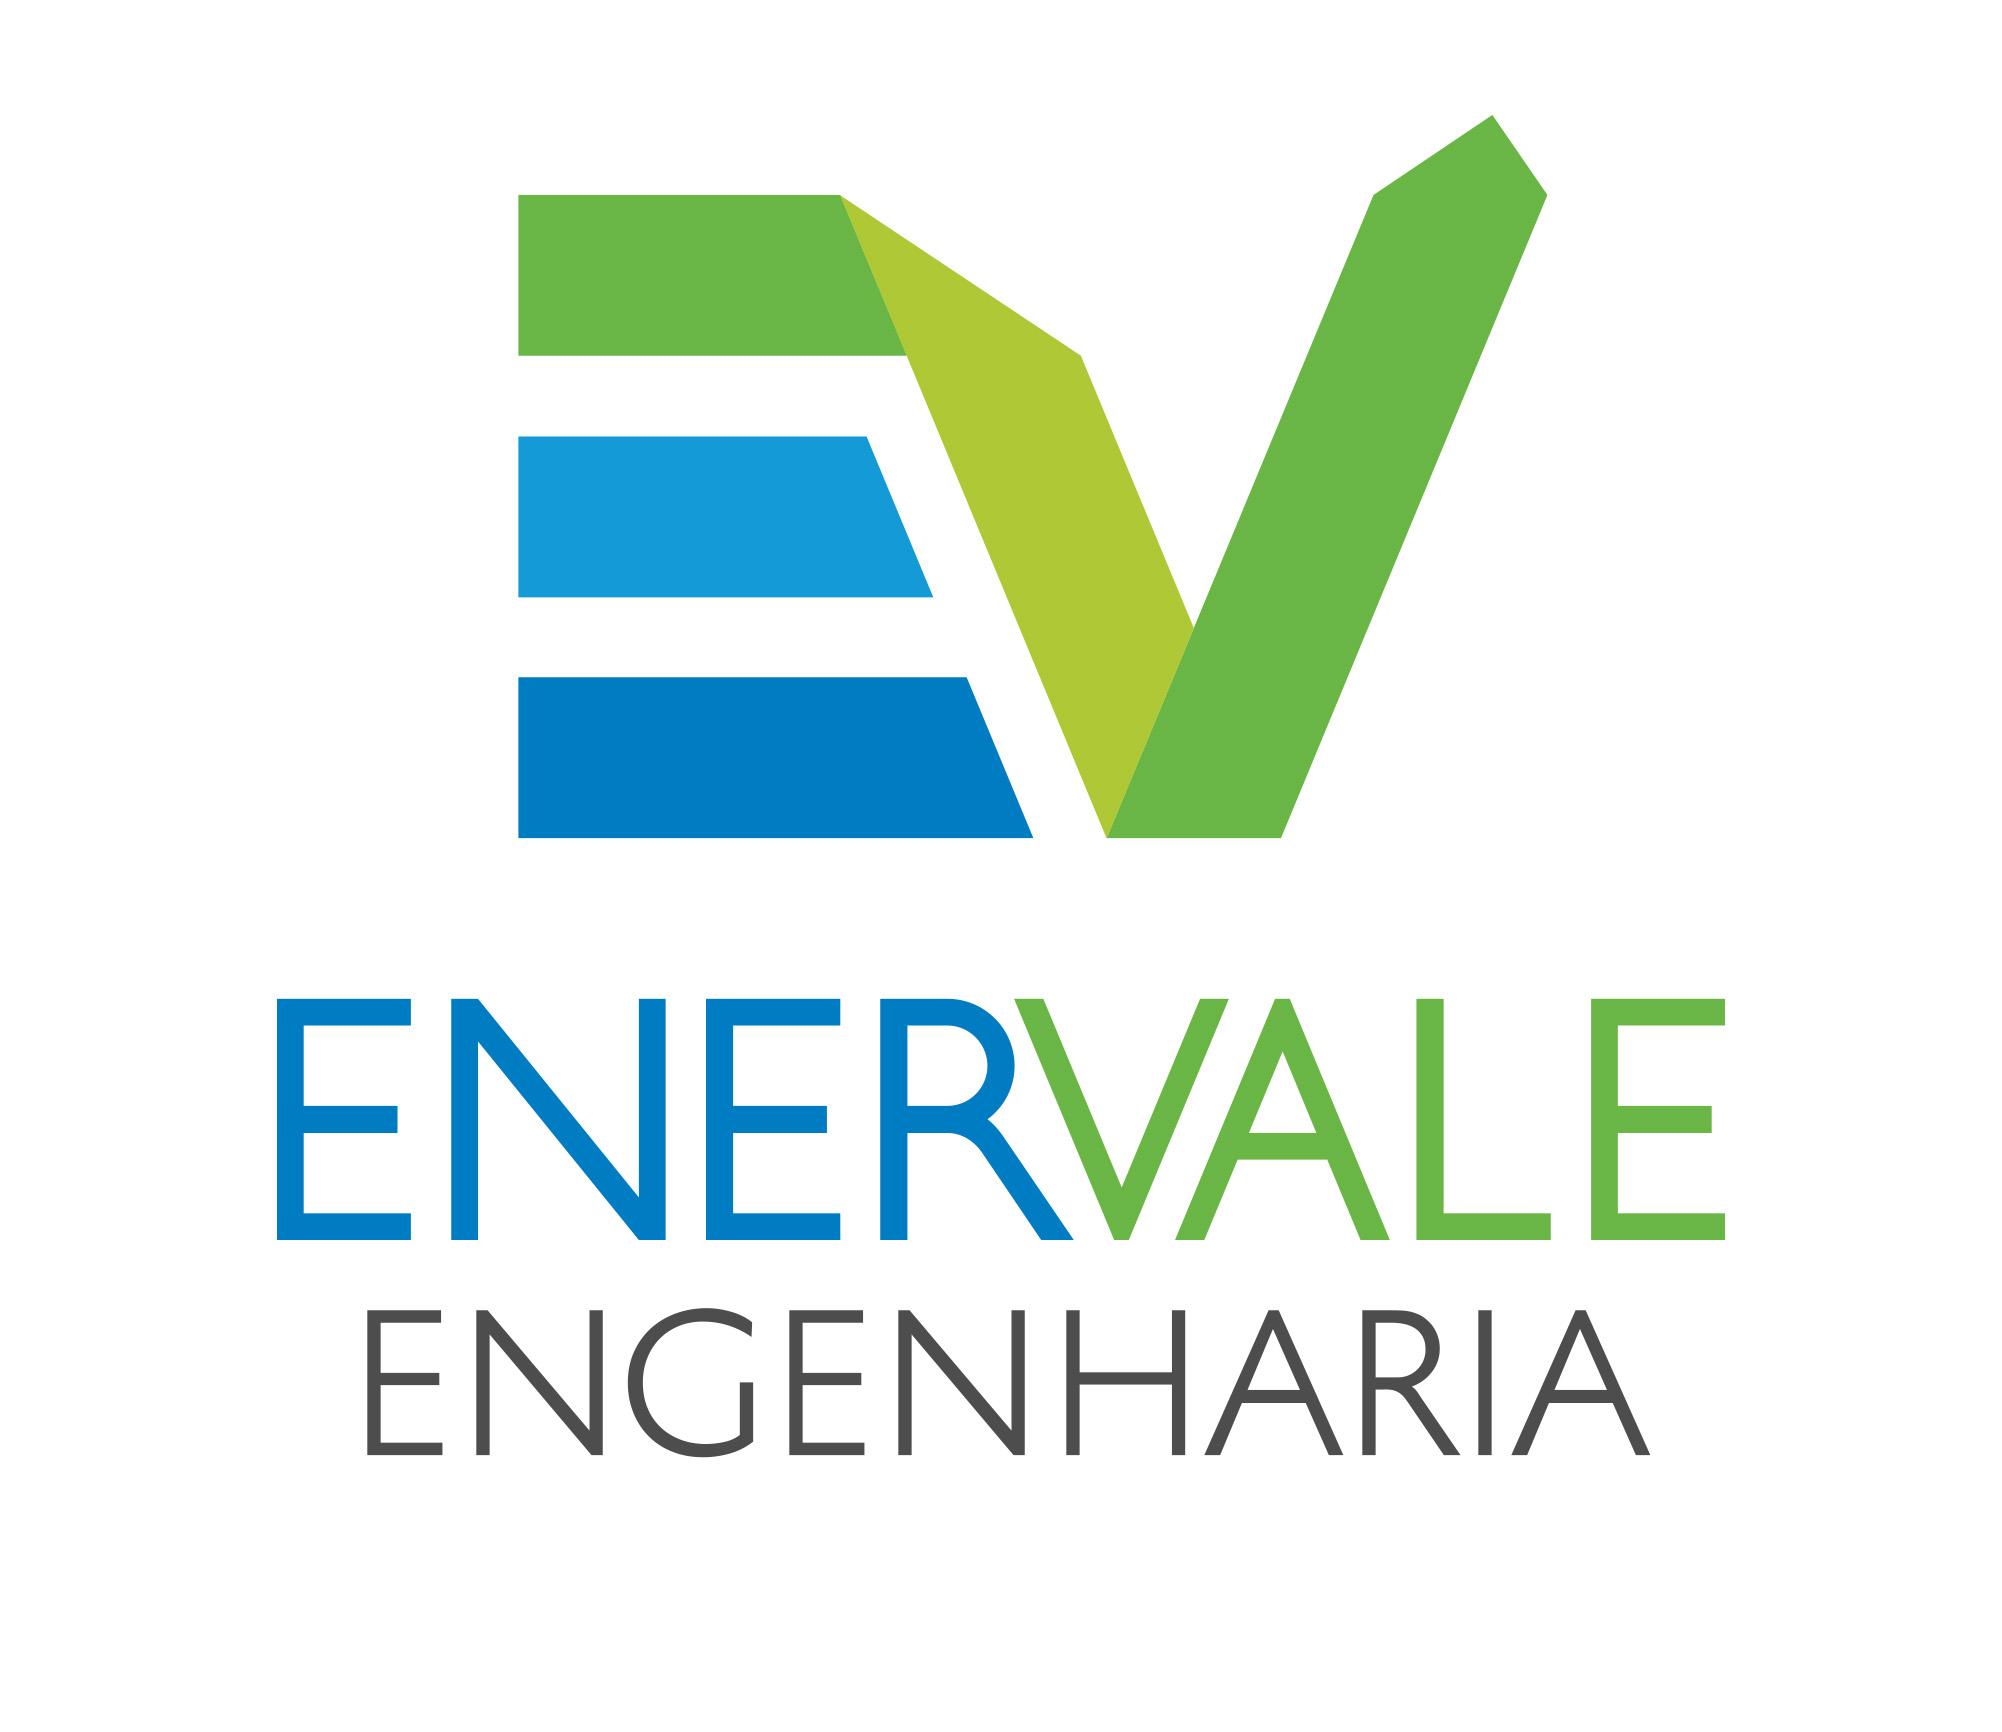 ENERVALE ENGENHARIA